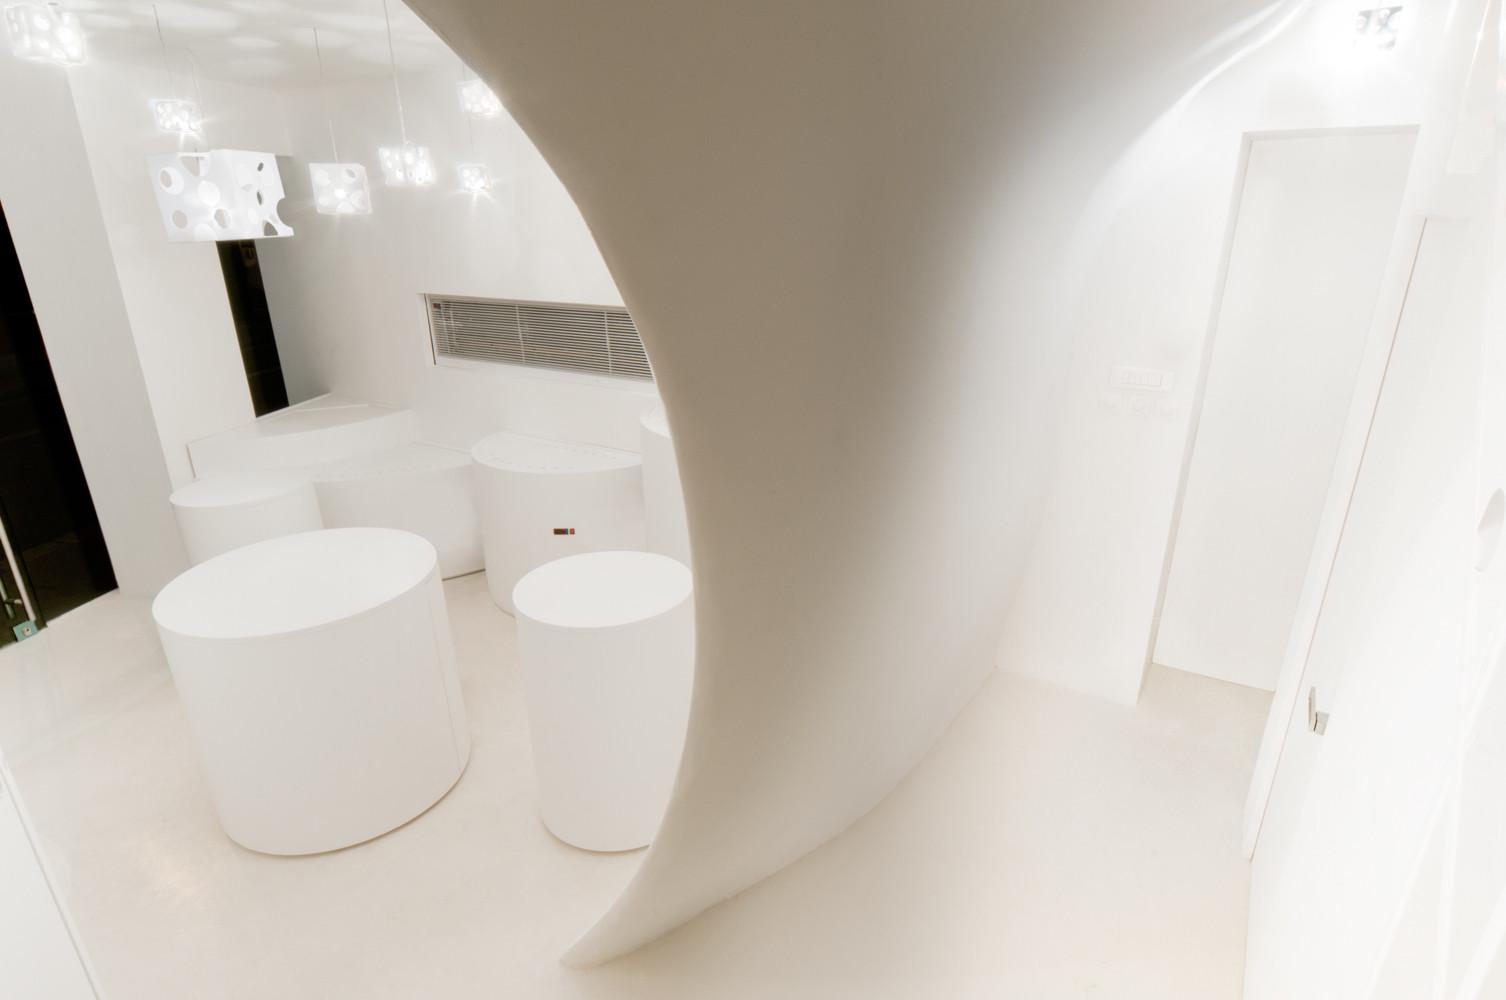 Salon du Fromage / Kotaro Horiuchi Architecture, Courtesy of Kotaro Horiuchi Architecture